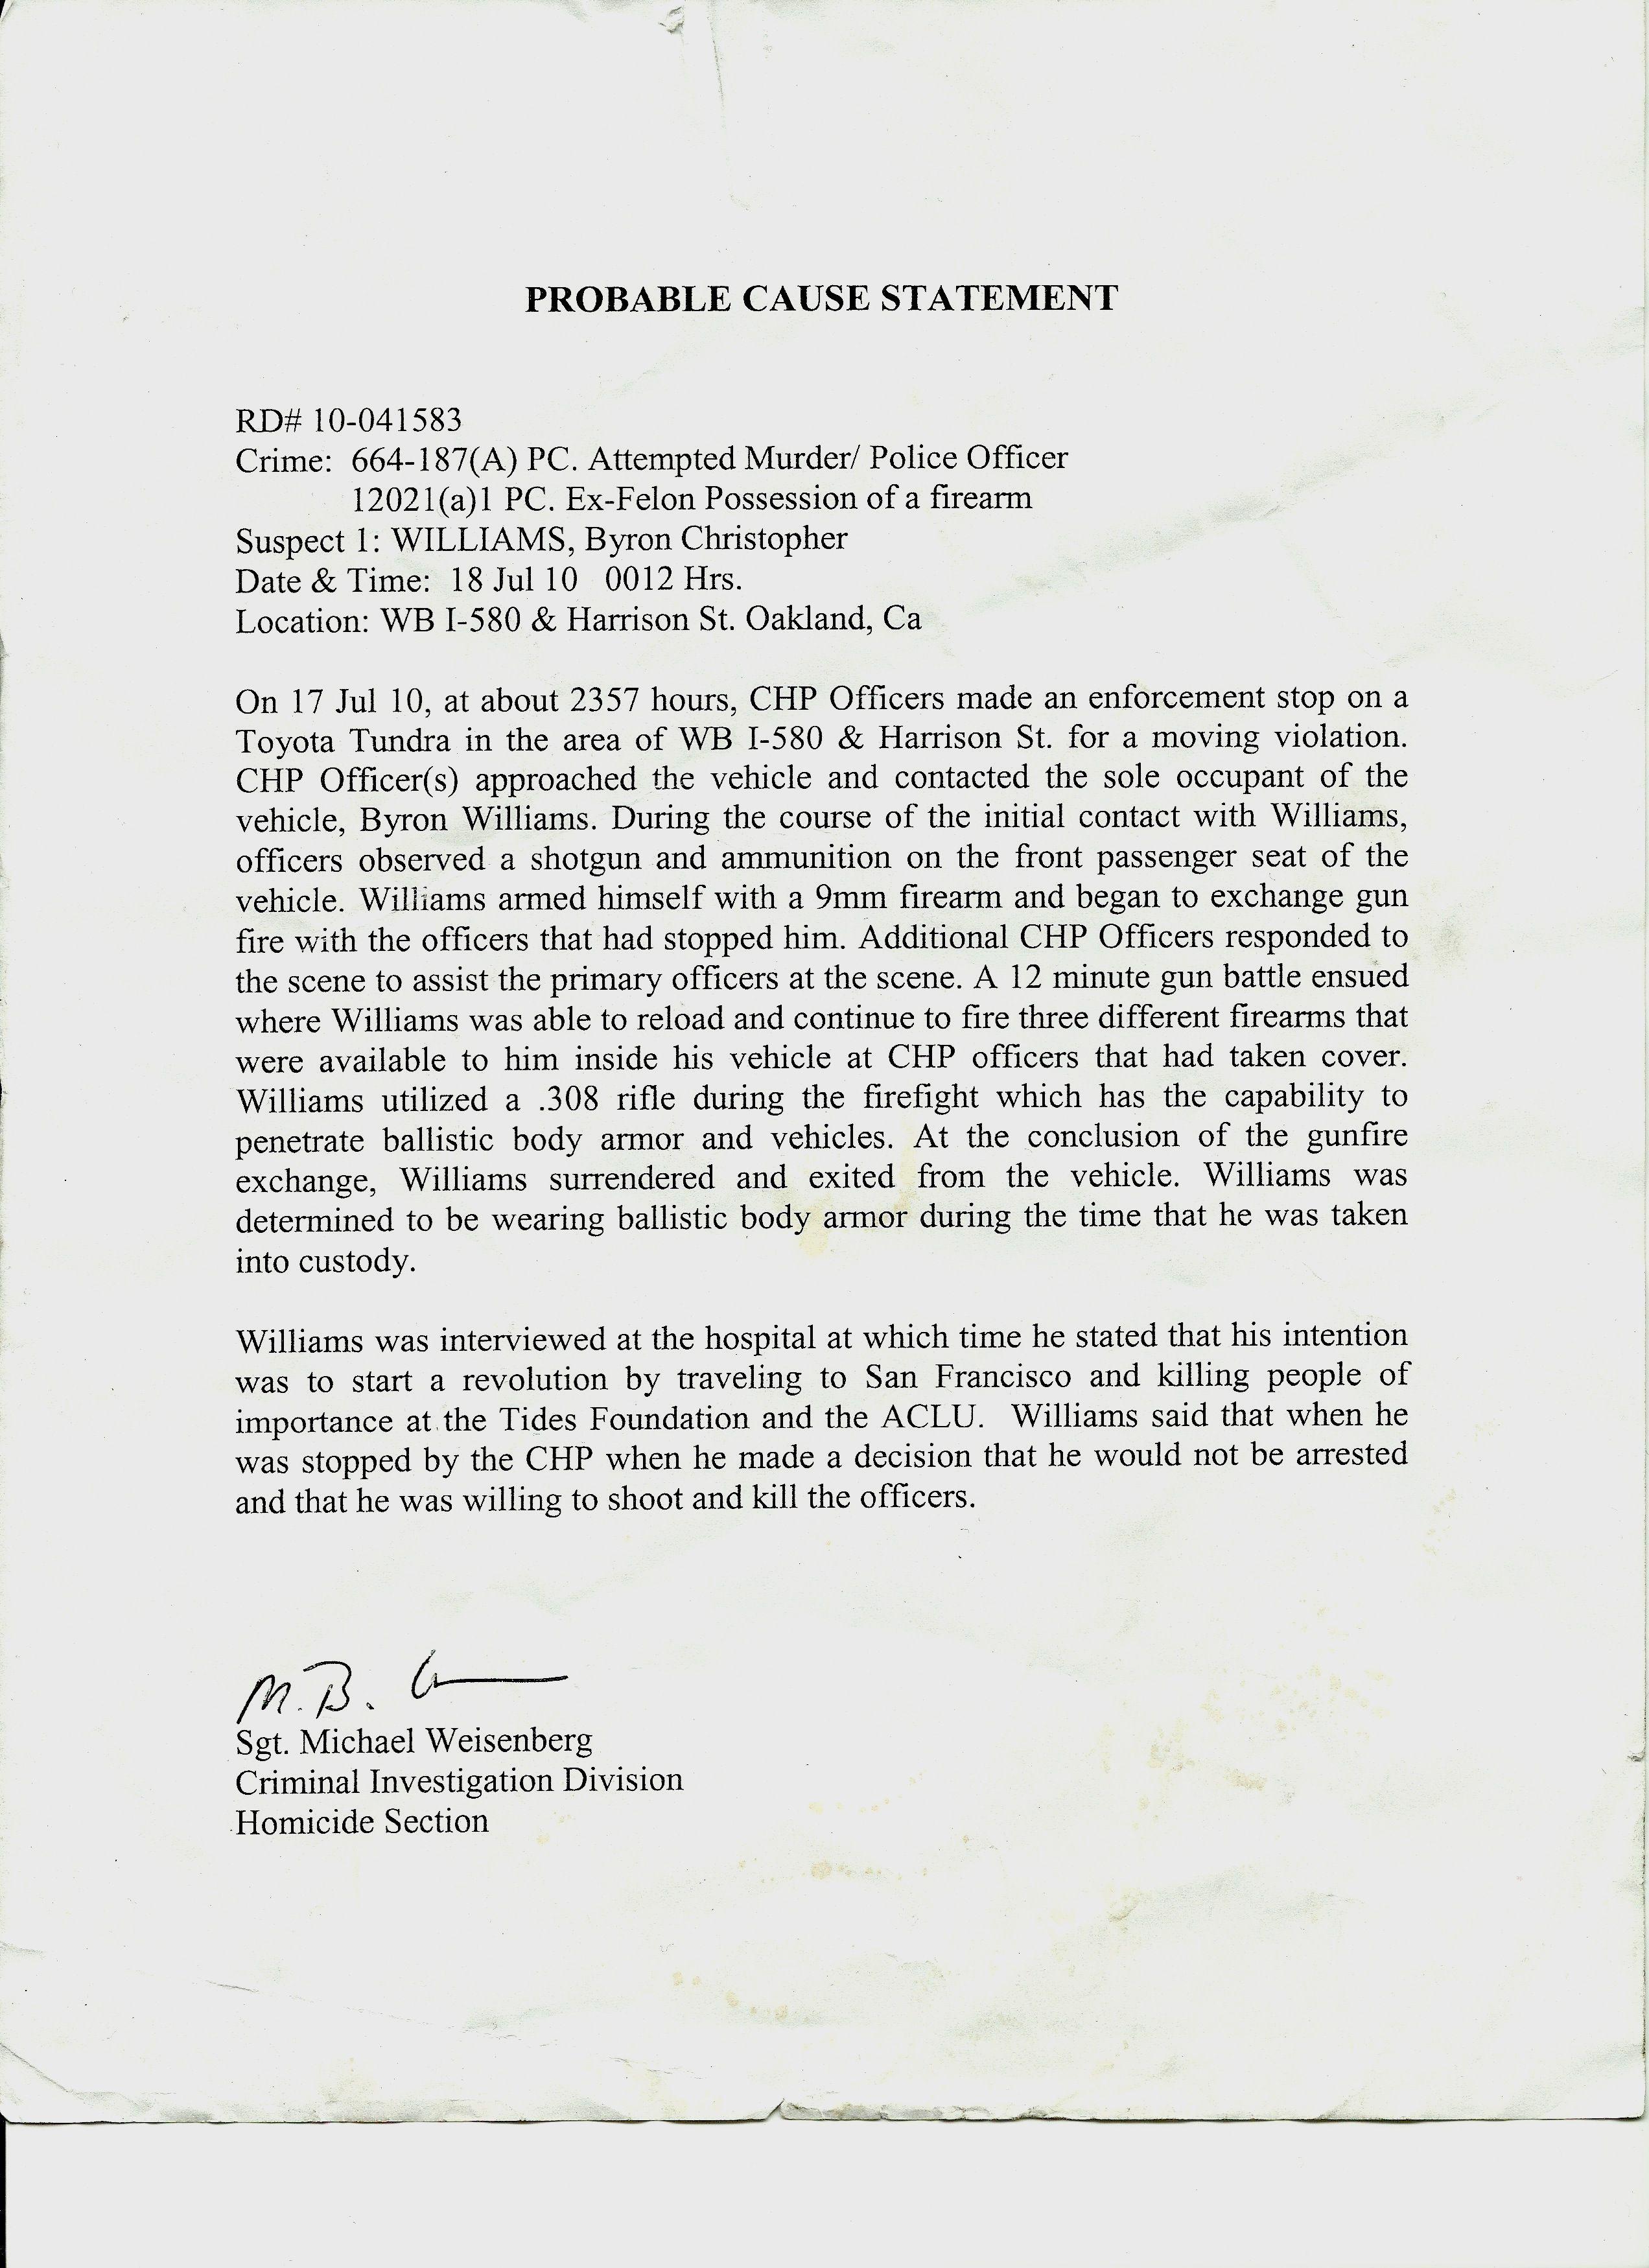 Green Card Affidavit Letter Sample Bagnas Of Character